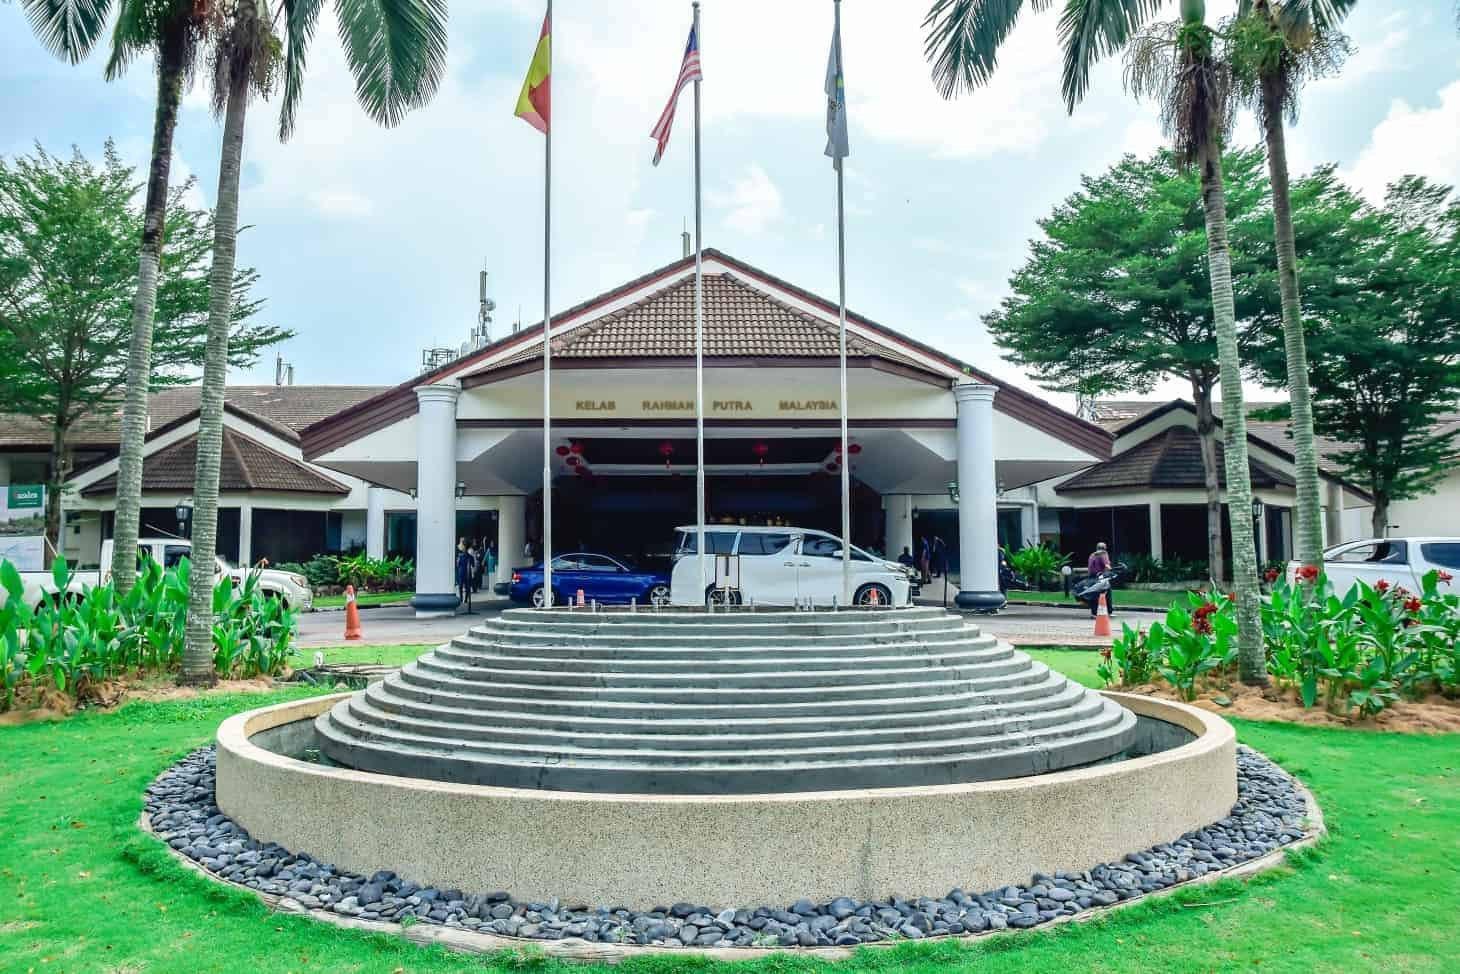 kelab Rahman Putra Malaysia Photo 1